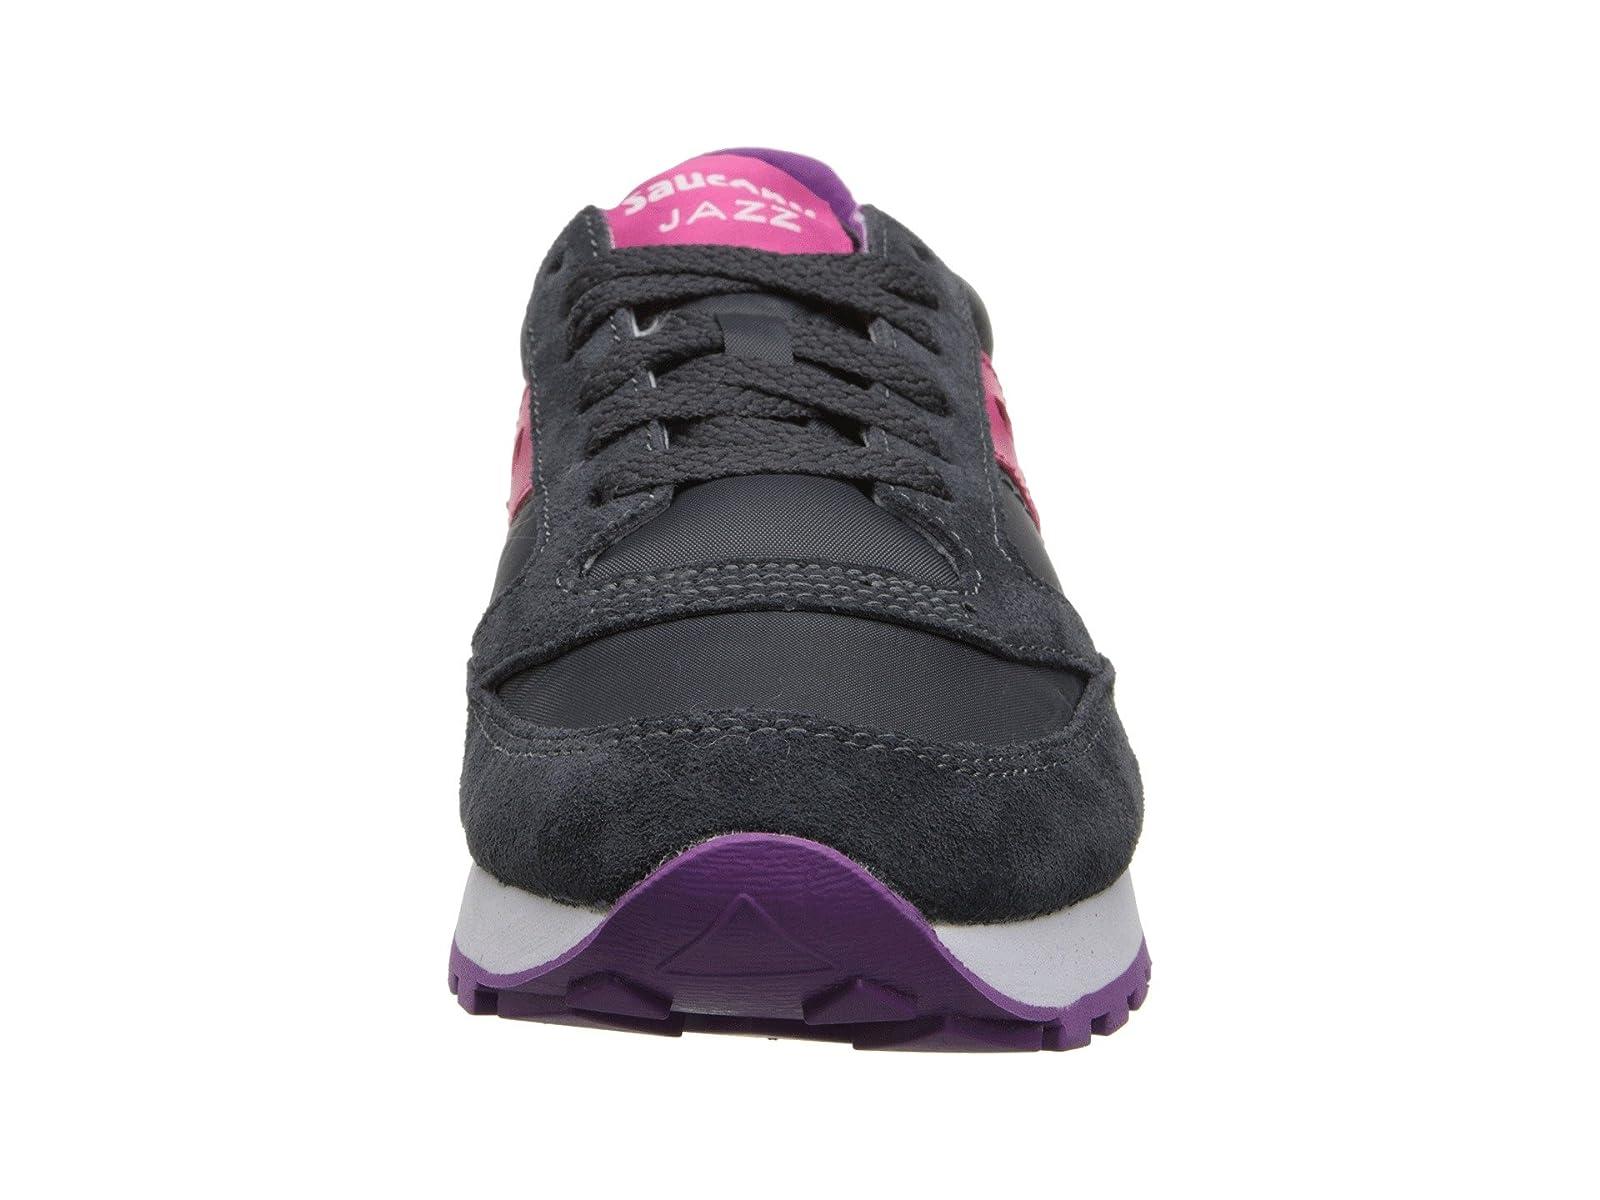 Woman-039-s-Sneakers-amp-Athletic-Shoes-Saucony-Originals-Jazz-Original thumbnail 15